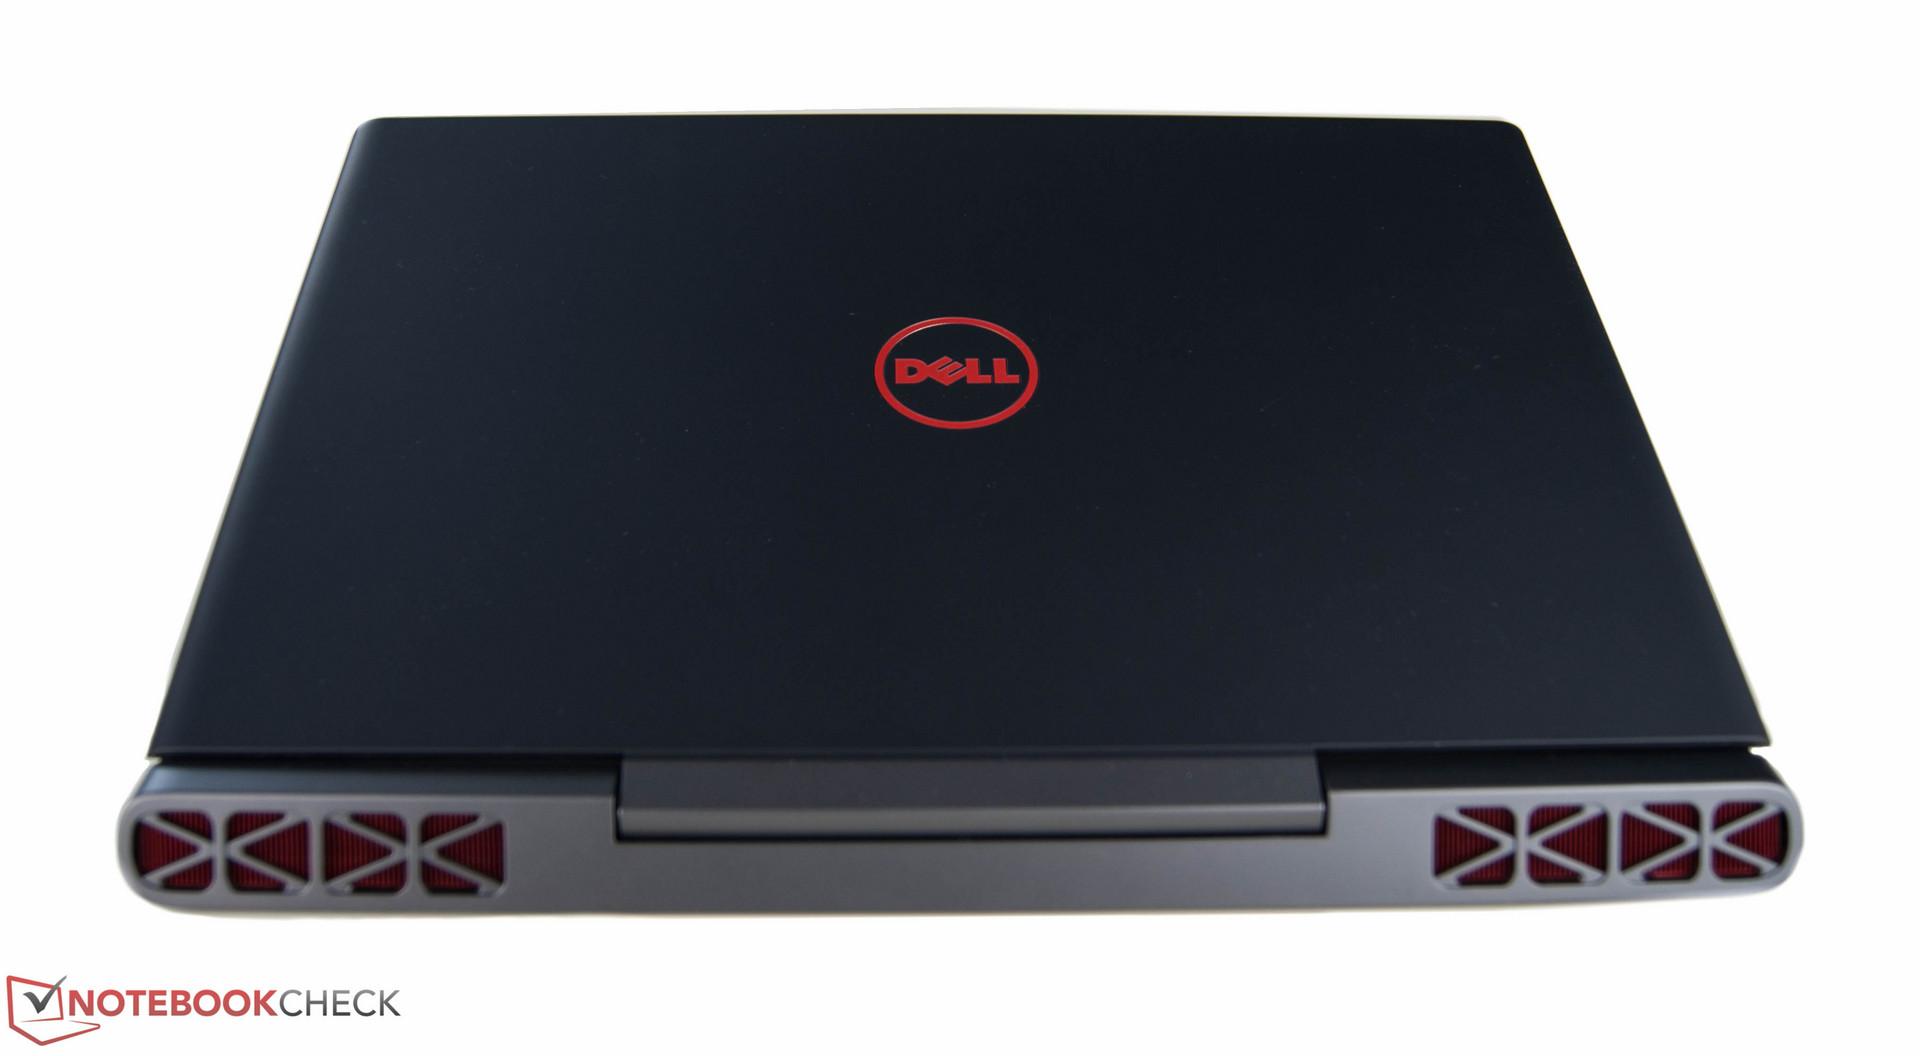 Dell Inspiron 15 7567 5372 Notebookcheck Info